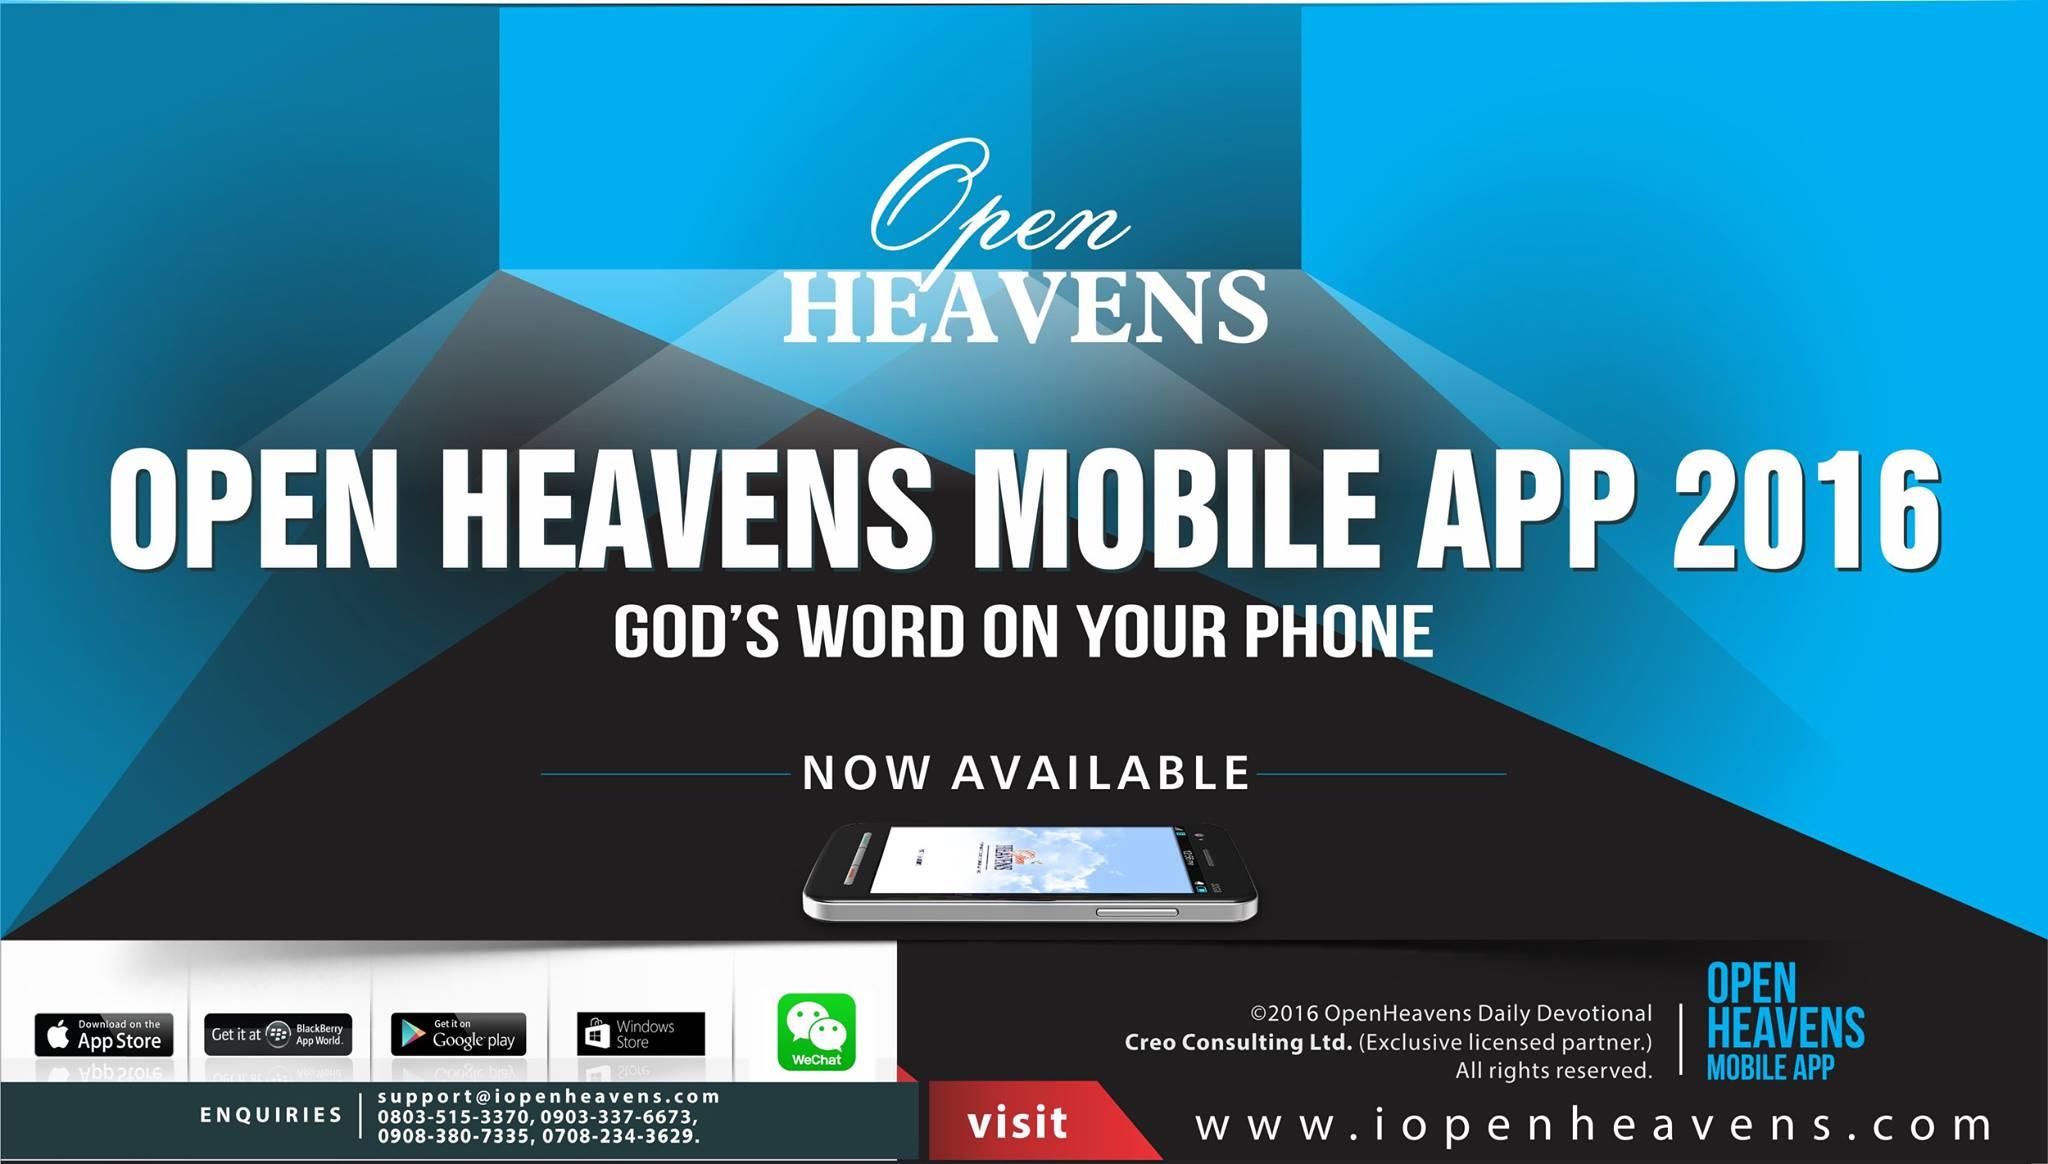 Open Heavens Promo